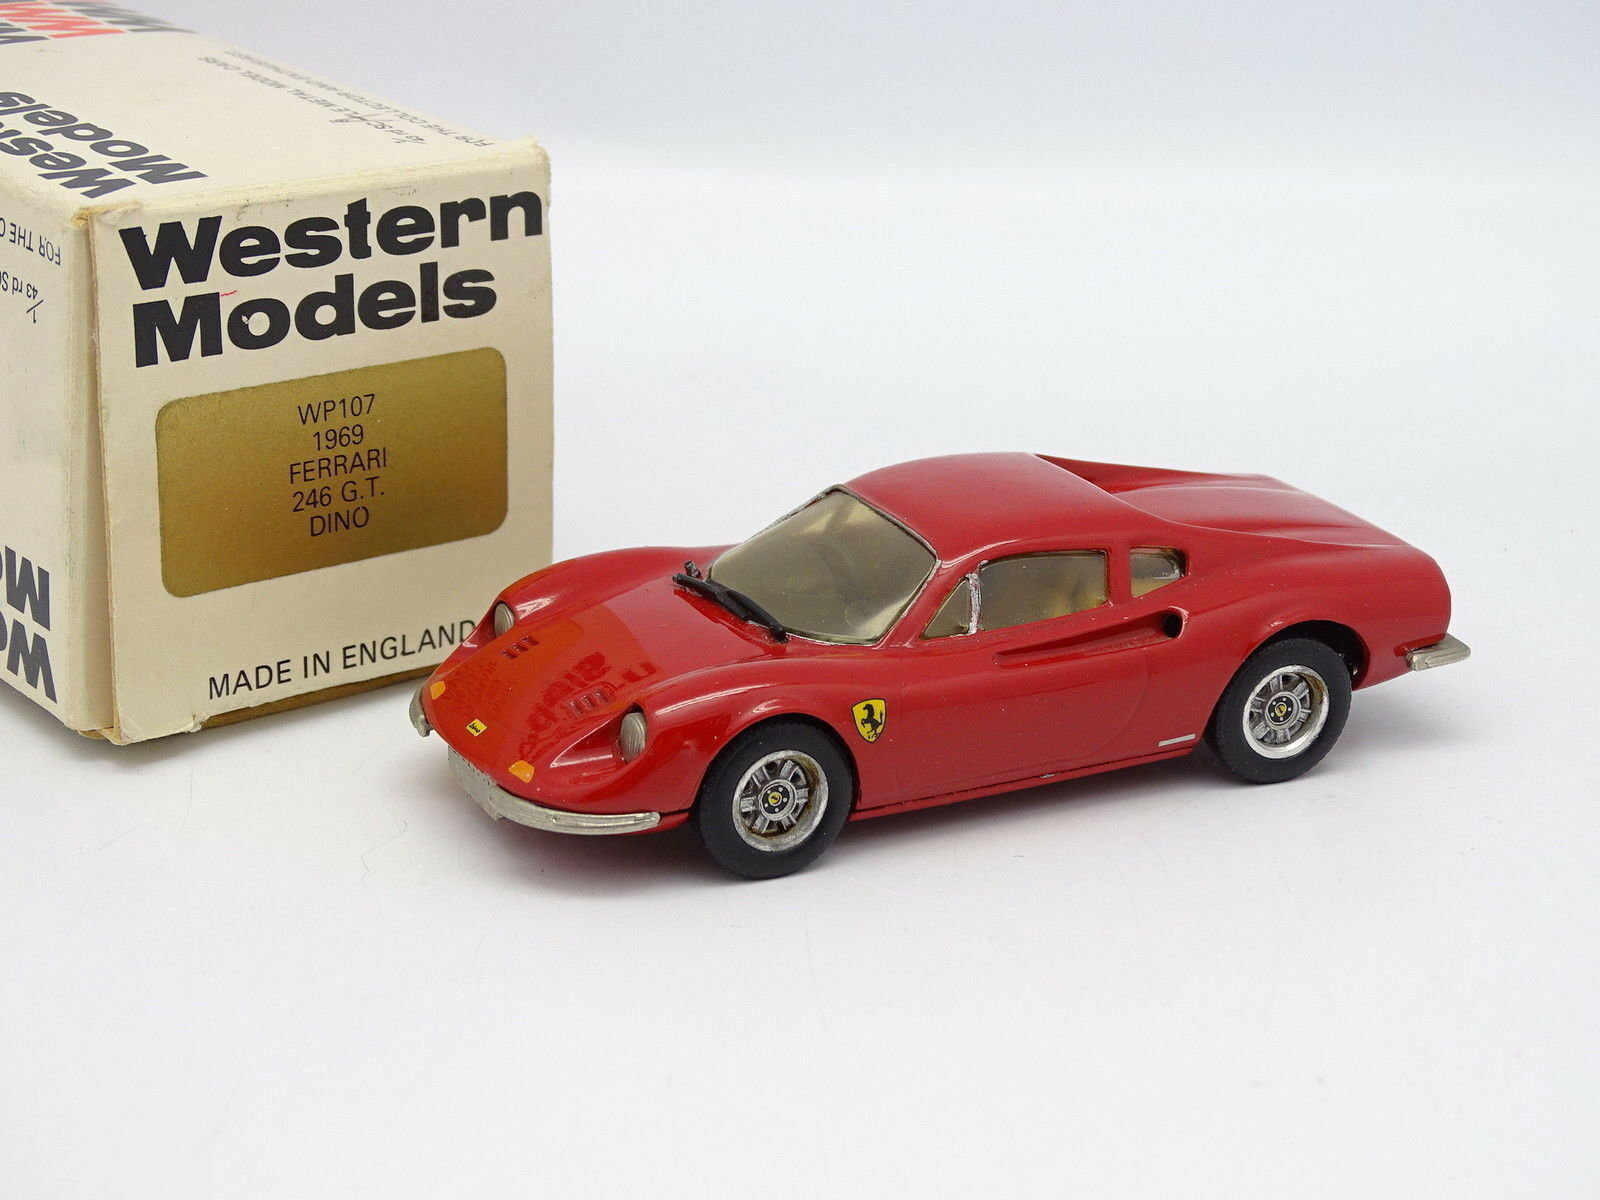 Western Models 1 43 - Ferrari Dino 246 GT rosso